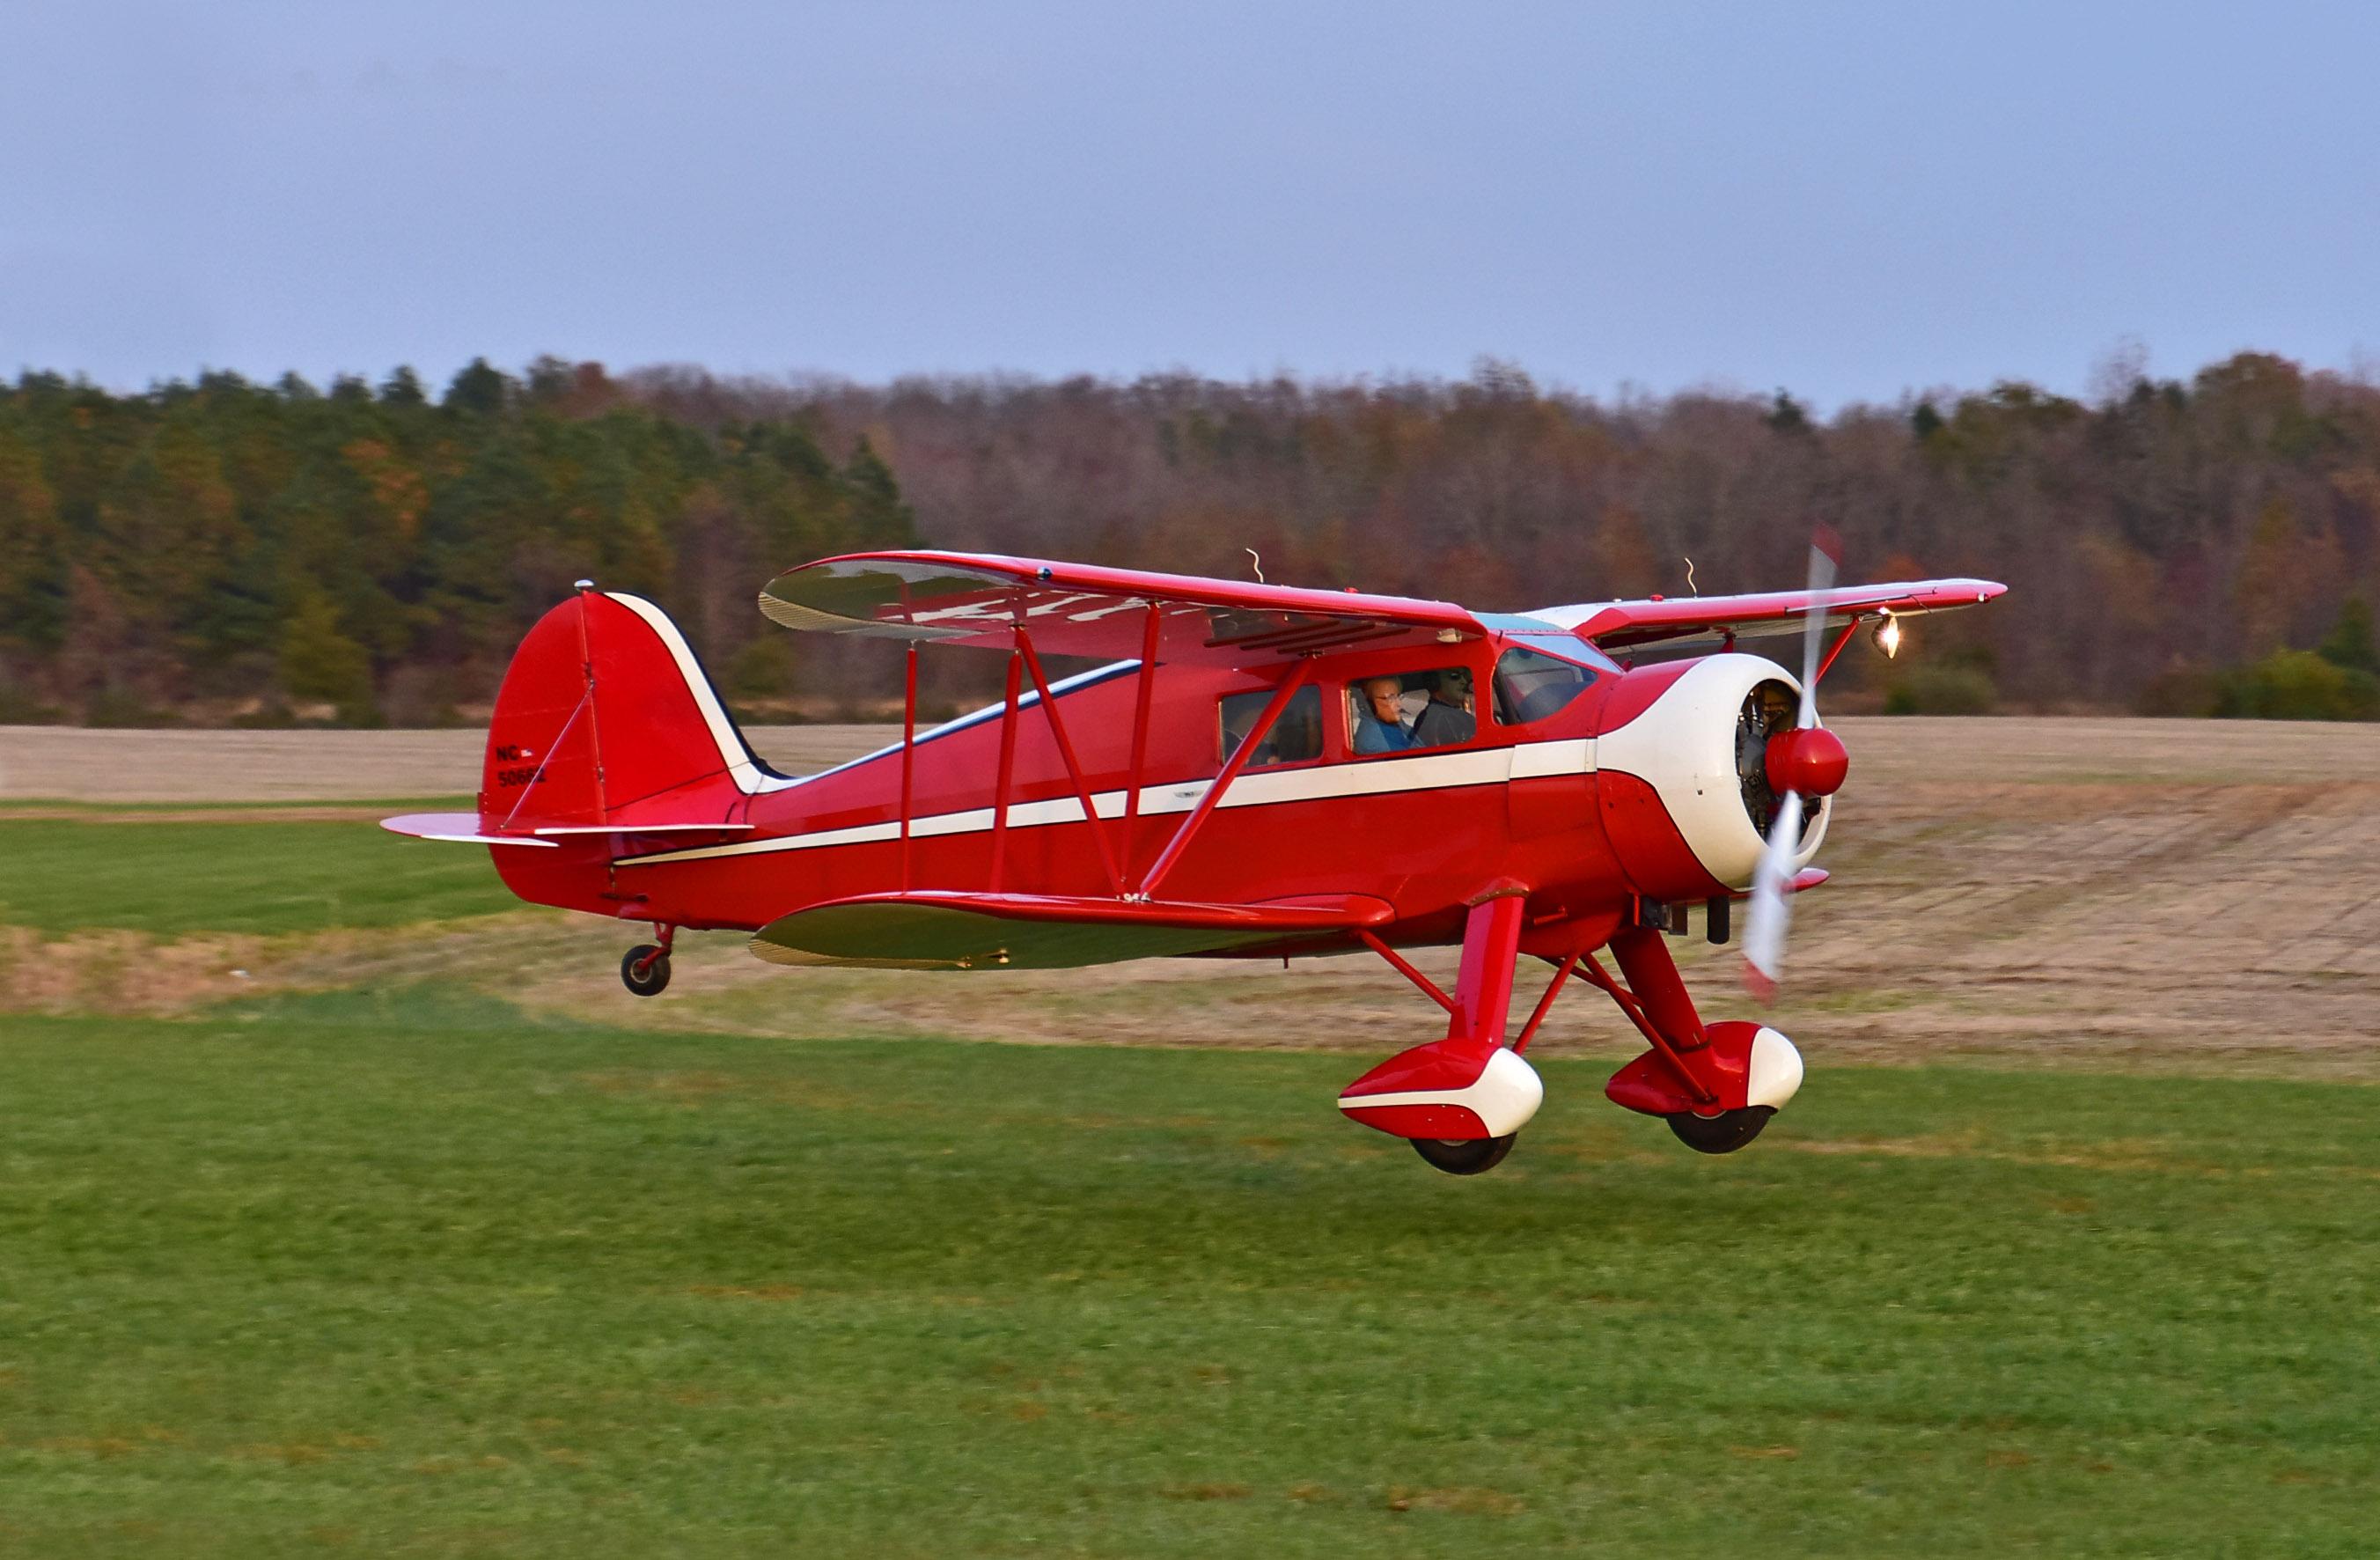 Chili Fiesta Fly-In at Massey Aerodrome